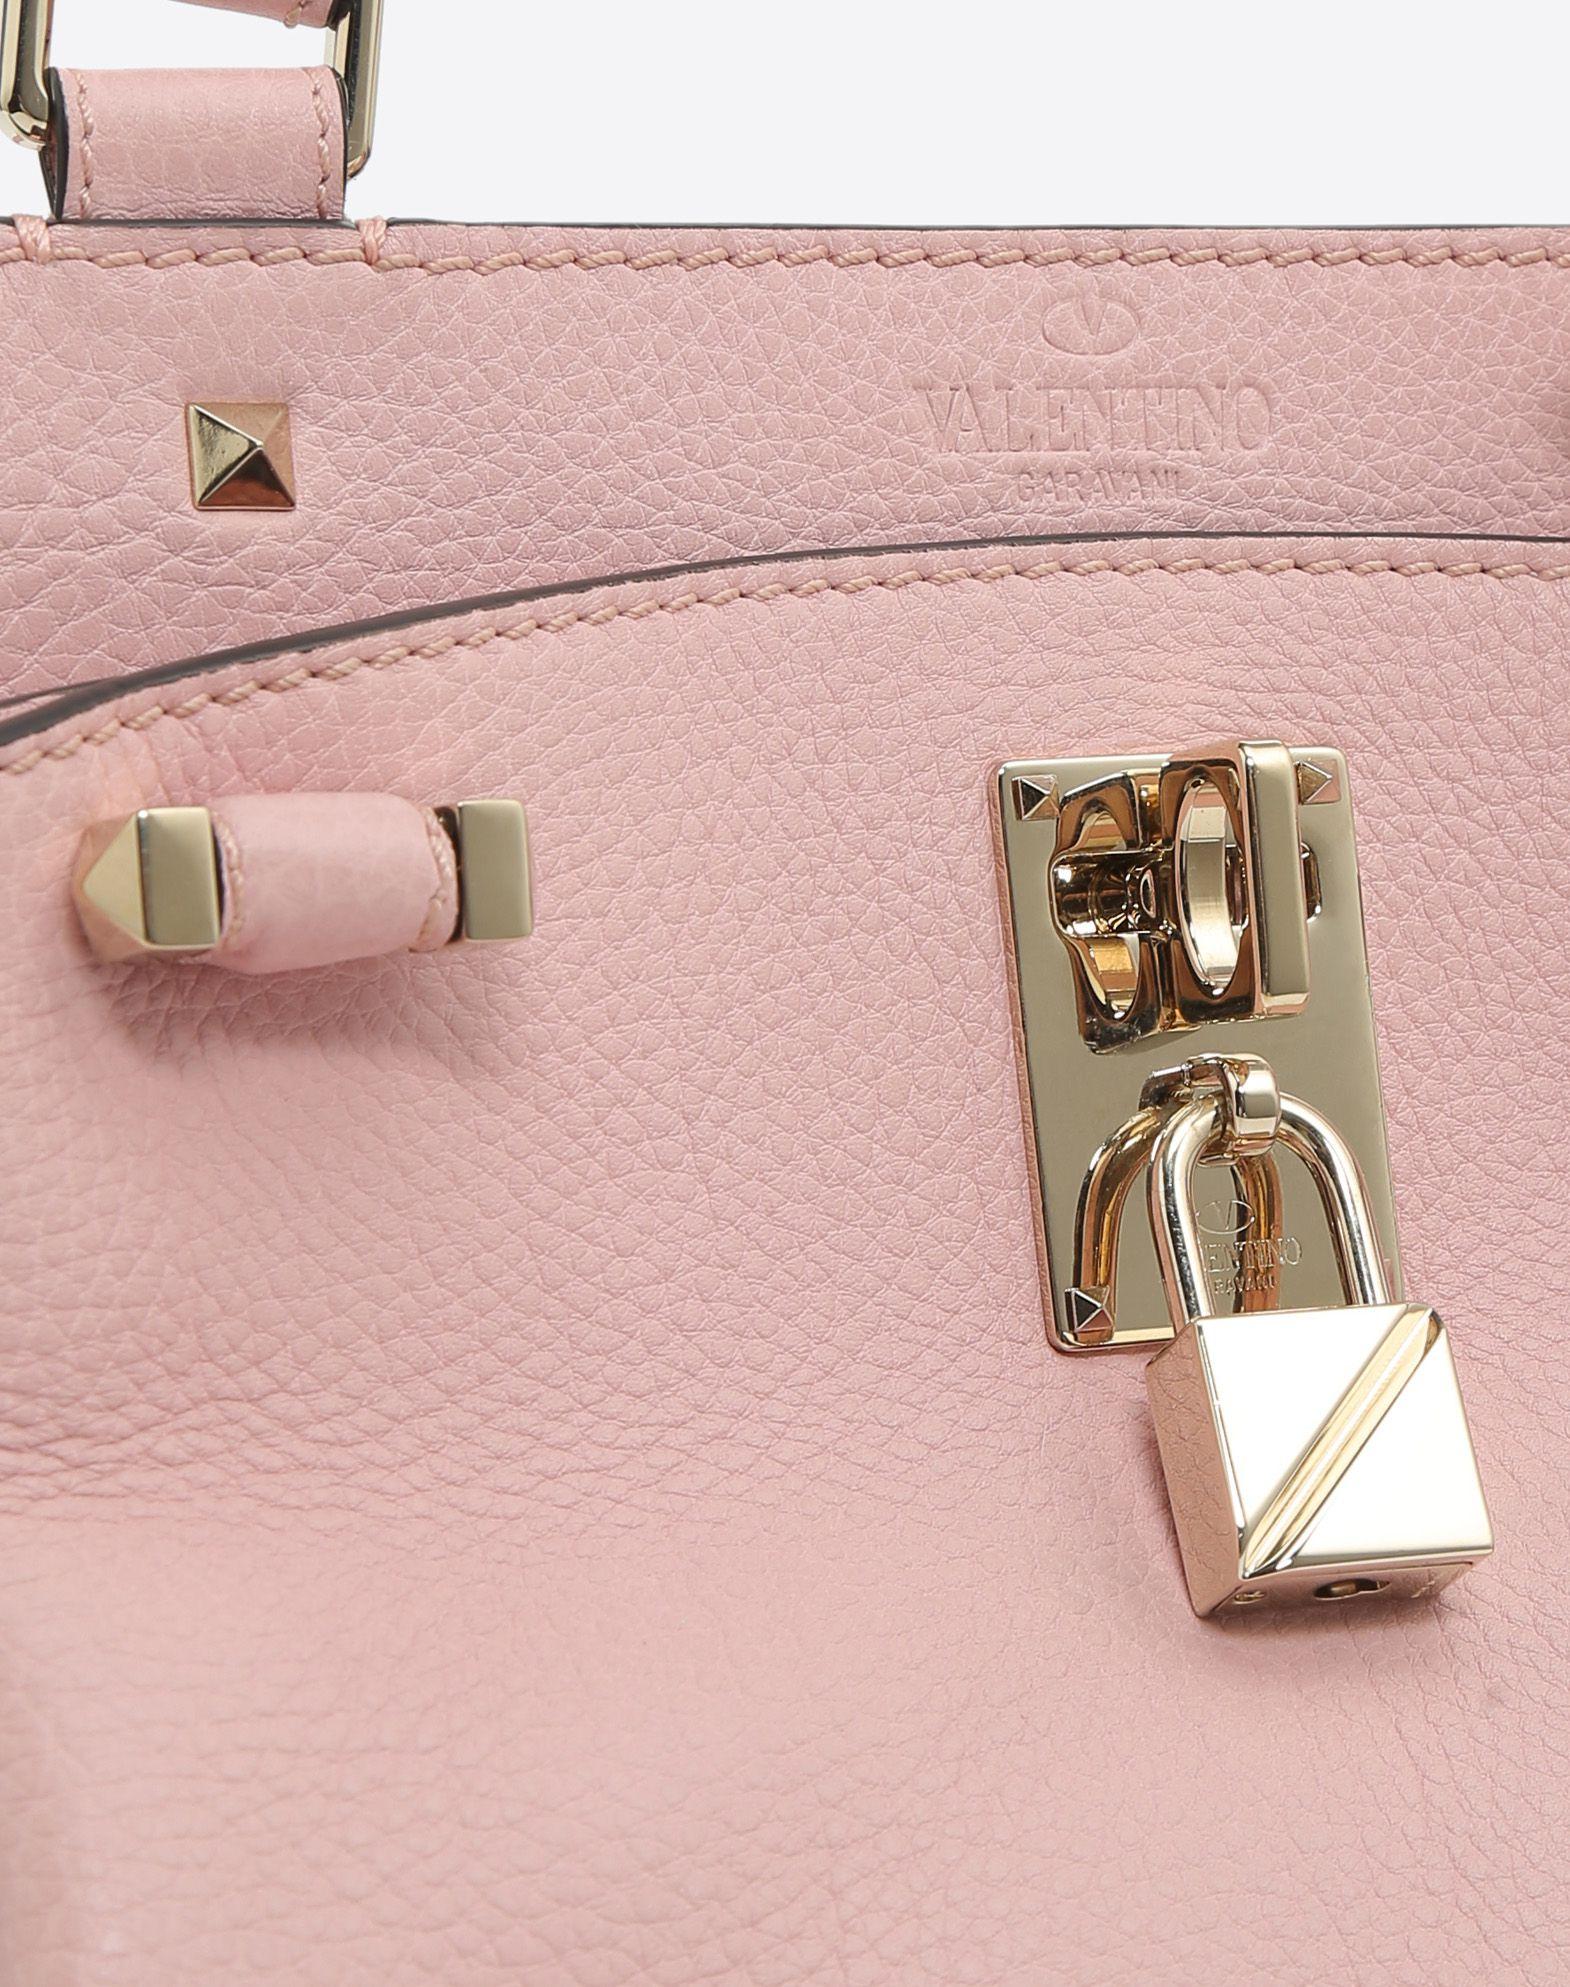 VALENTINO GARAVANI Joylock Small Handle Bag HANDBAG D b